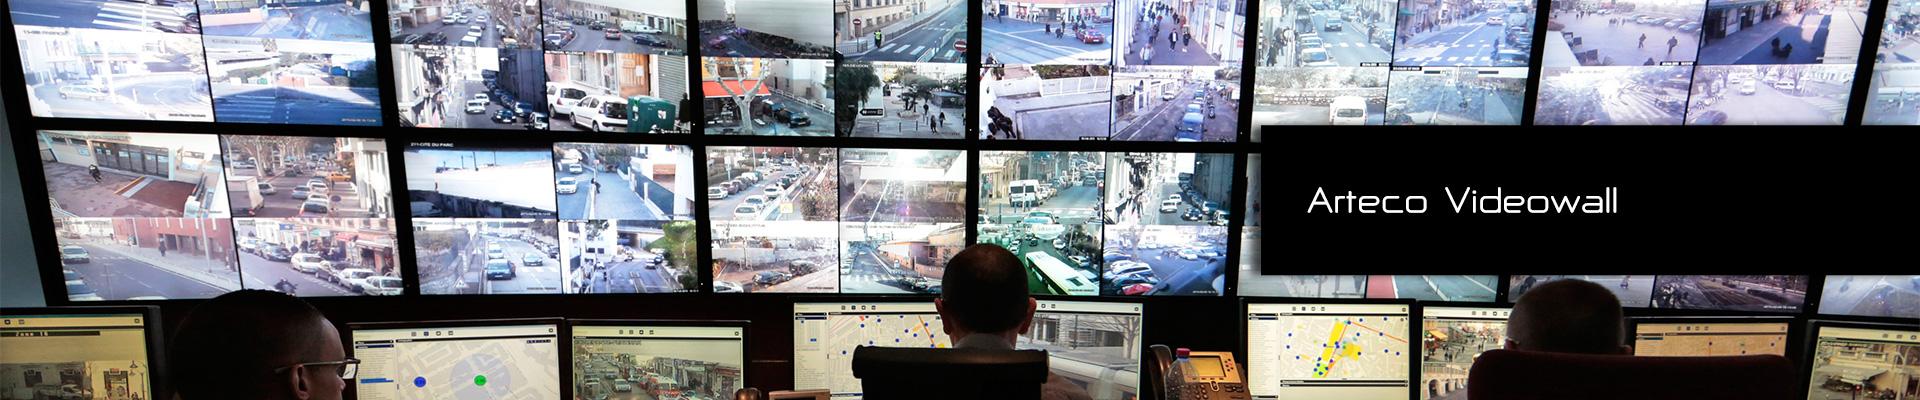 Arteco arteco global: video security, industrial automation, building